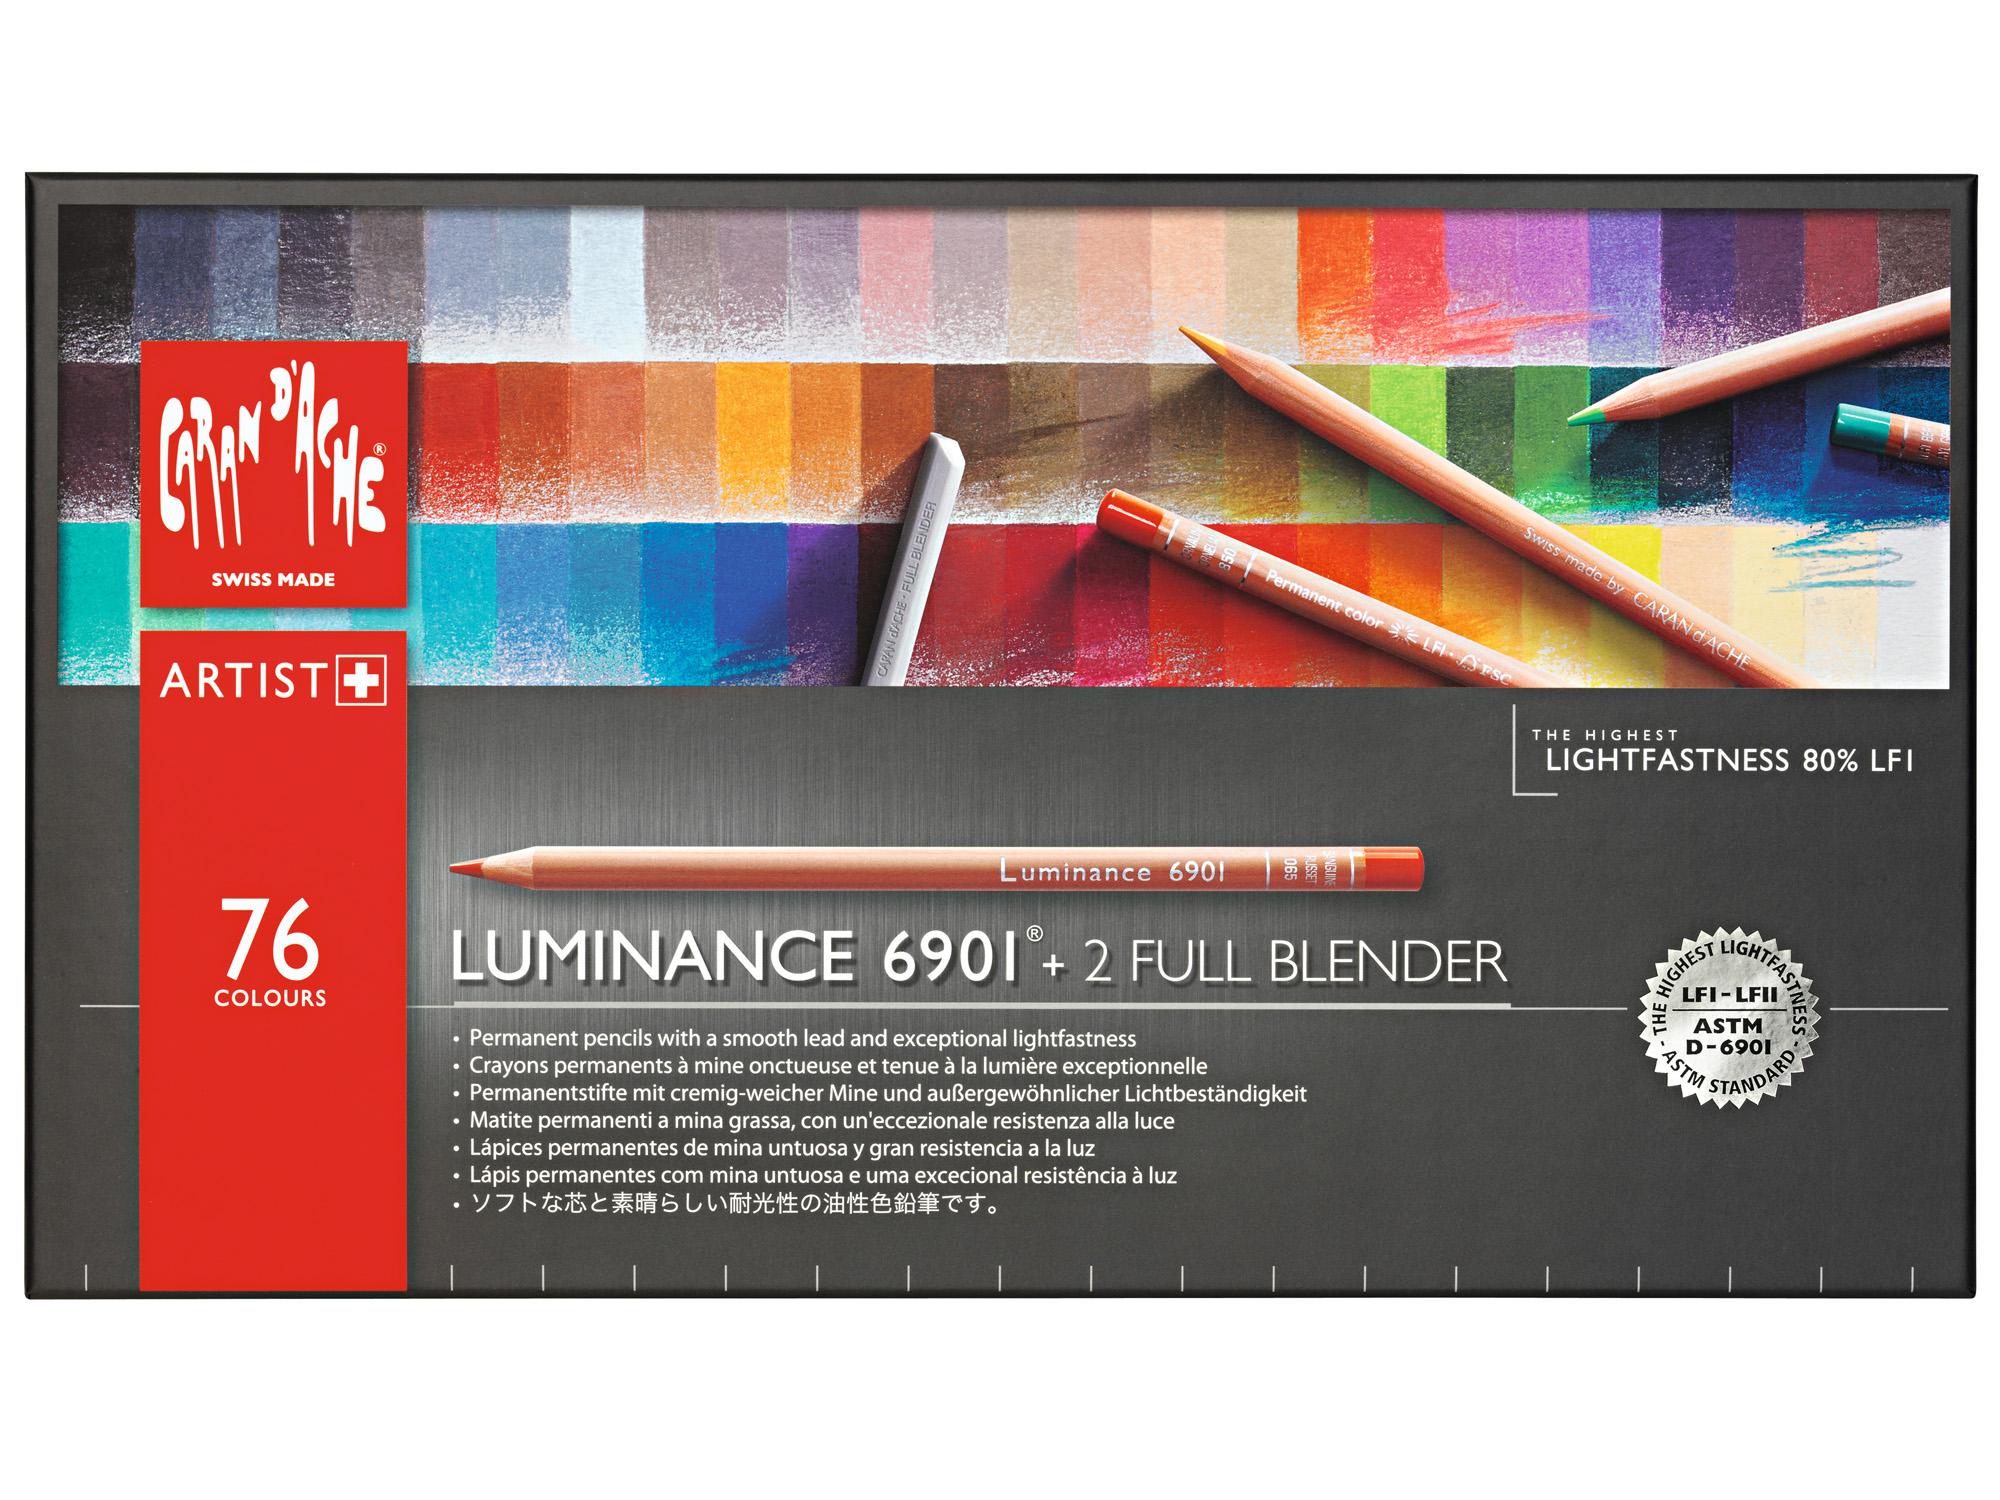 Caran D Ache Luminance 6901 174 Box Of 76 Pencils 2 Full